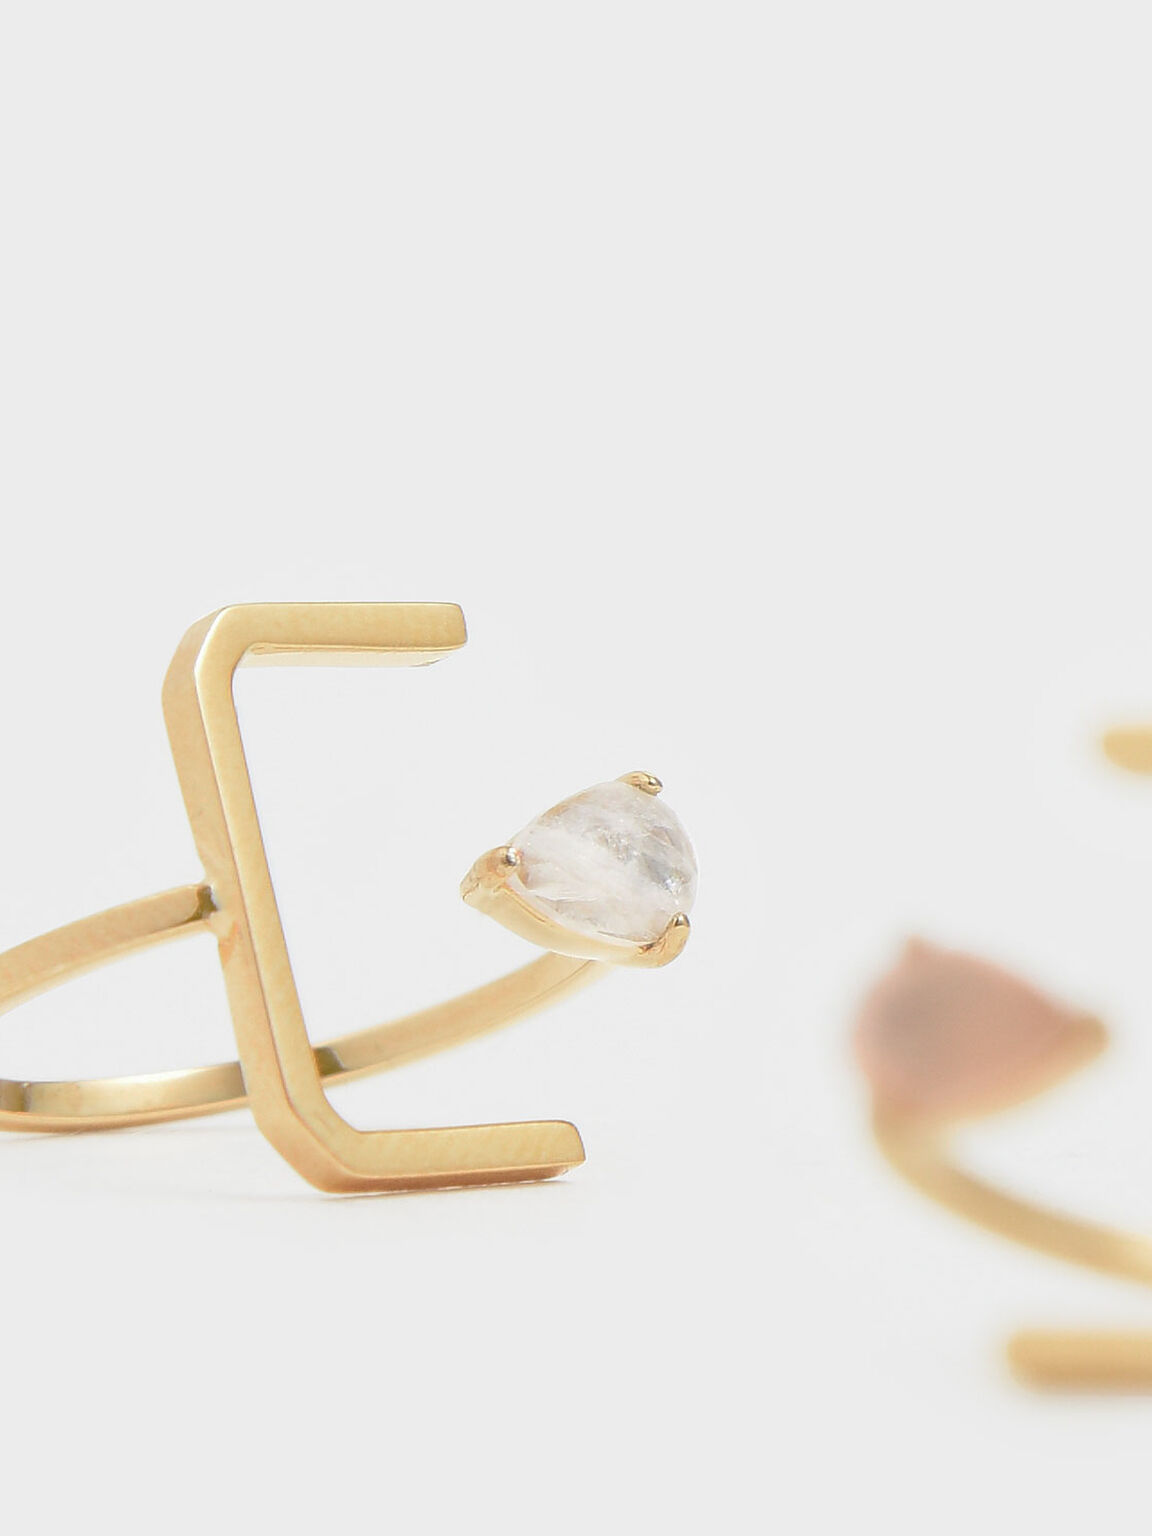 月光石U型戒指, 金色, hi-res